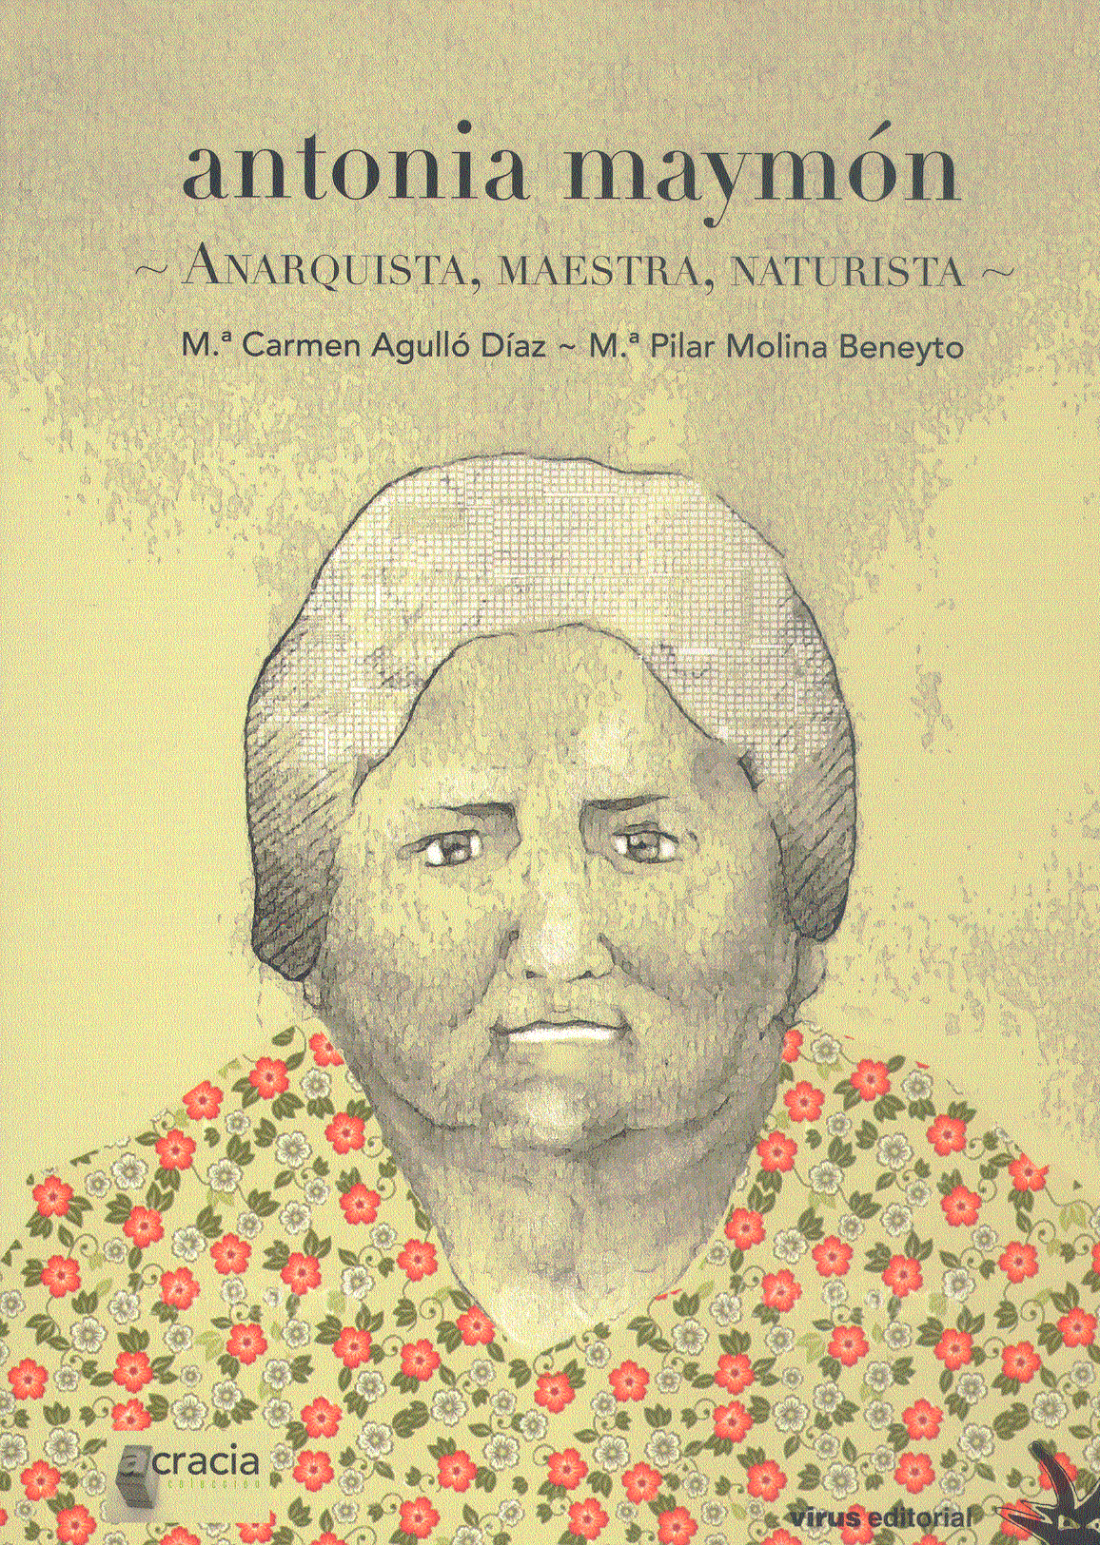 ANTONIA MAYMÓN – Anarquista, Maestra, Naturista